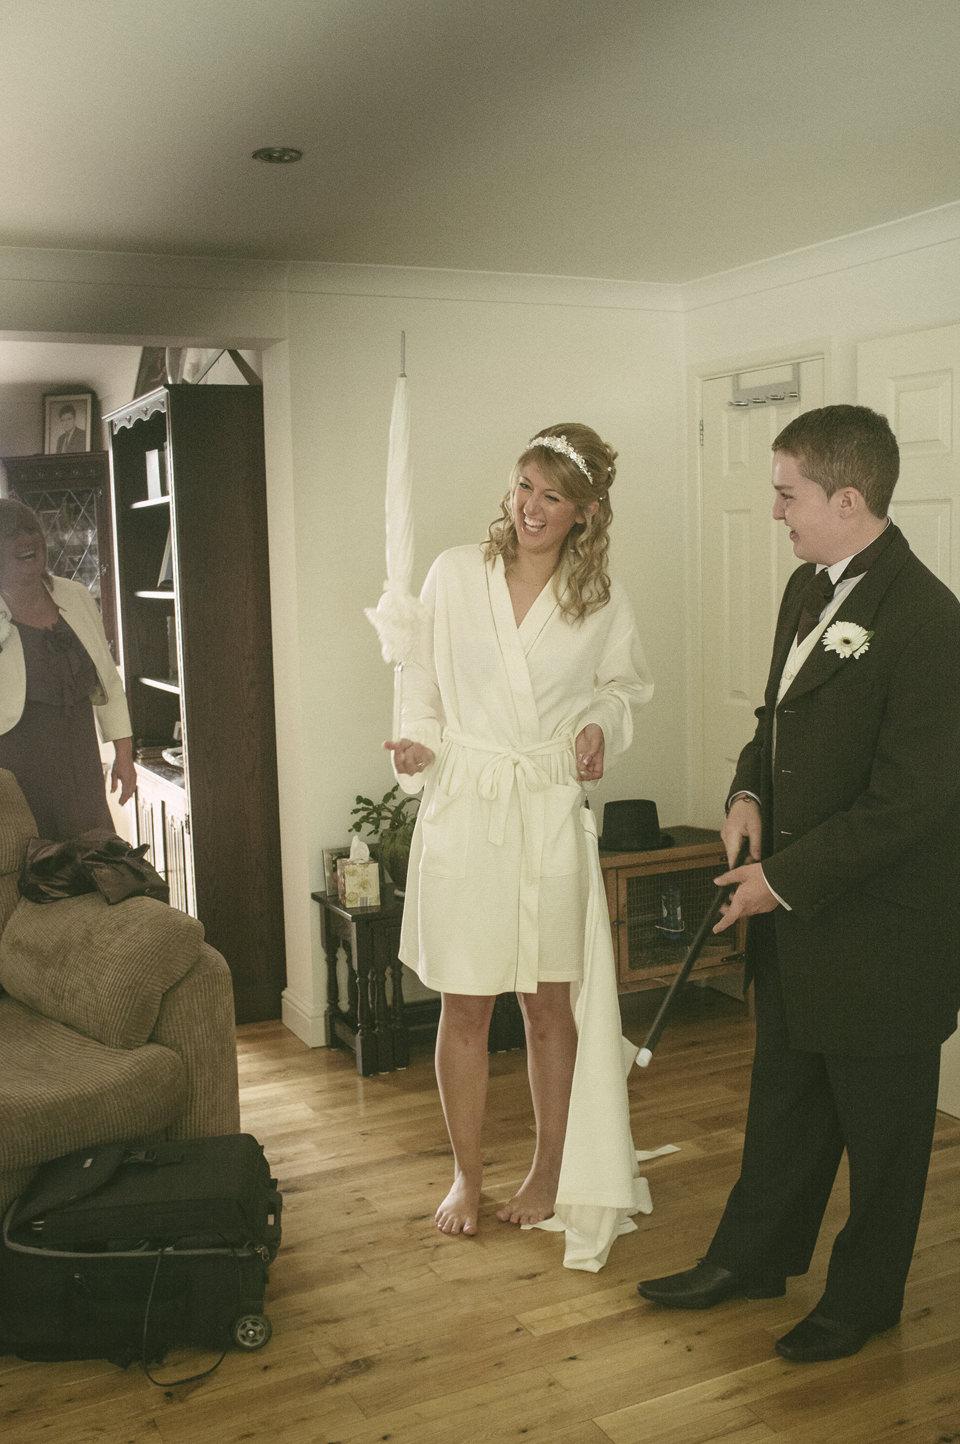 Nicola scott uk wedding photographs (23)